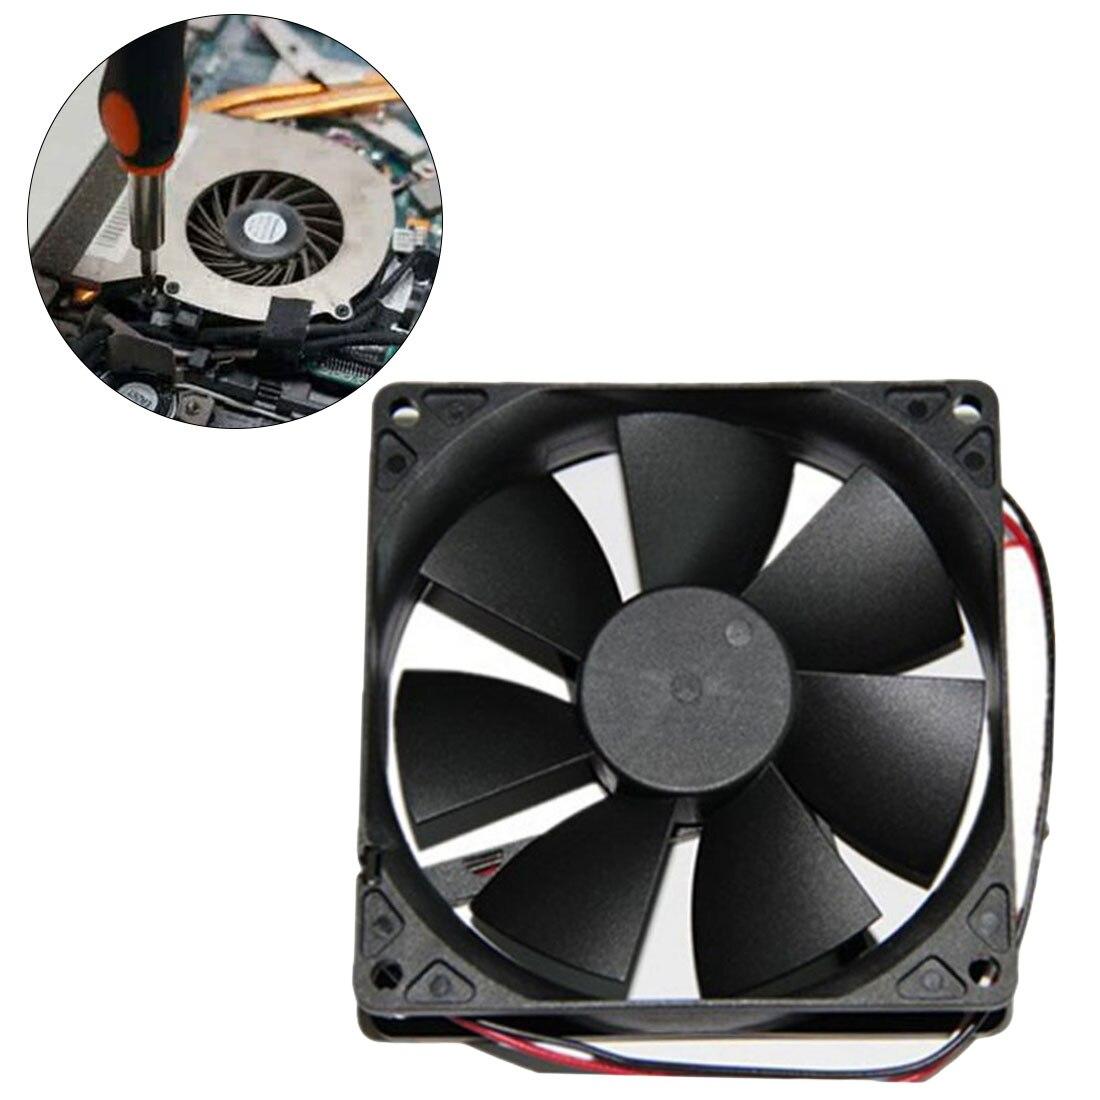 Blue LED Case Fan 12V 4Pin 80mm 80x25mm For Computer PC Host CPU Cooling Cooler